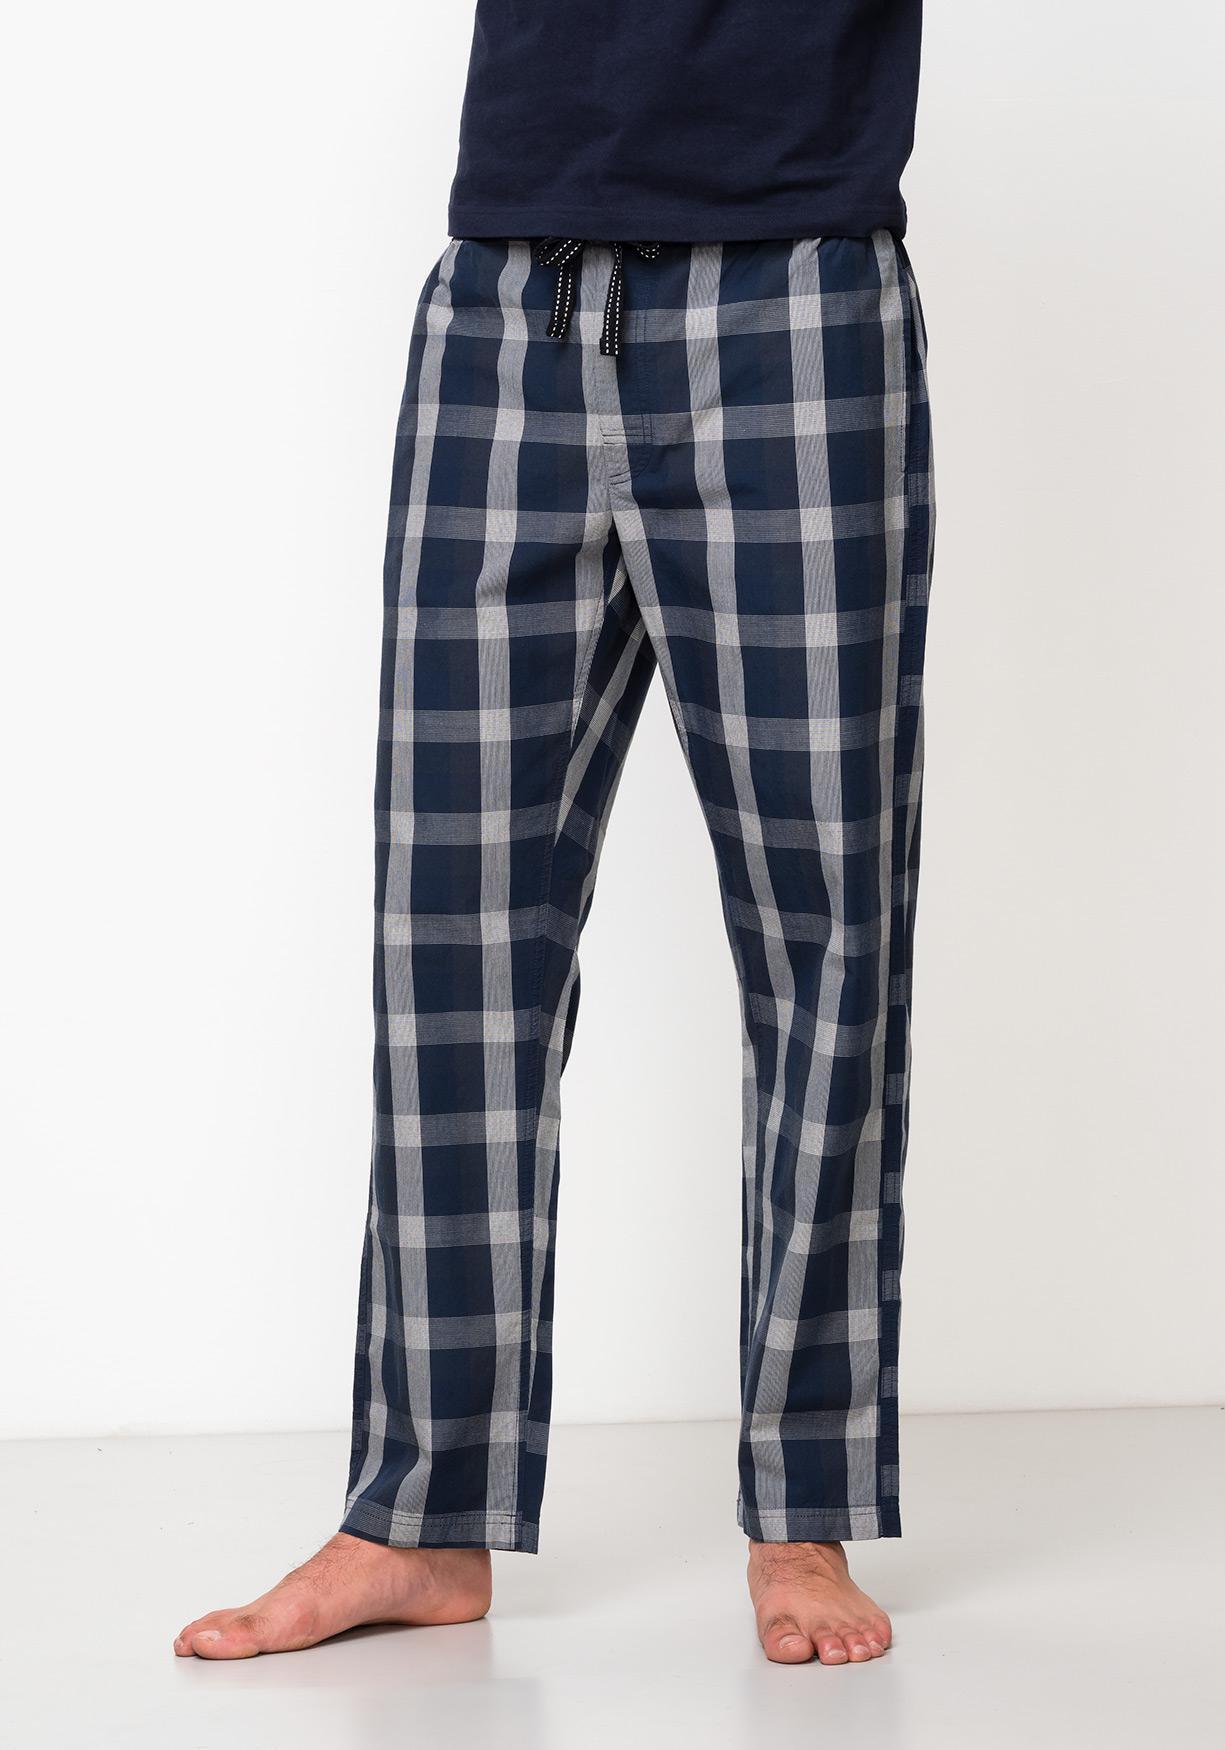 d204f464b75 Comprar Pantalón largo de pijama de cuadros TEX. ¡Aprovéchate de ...